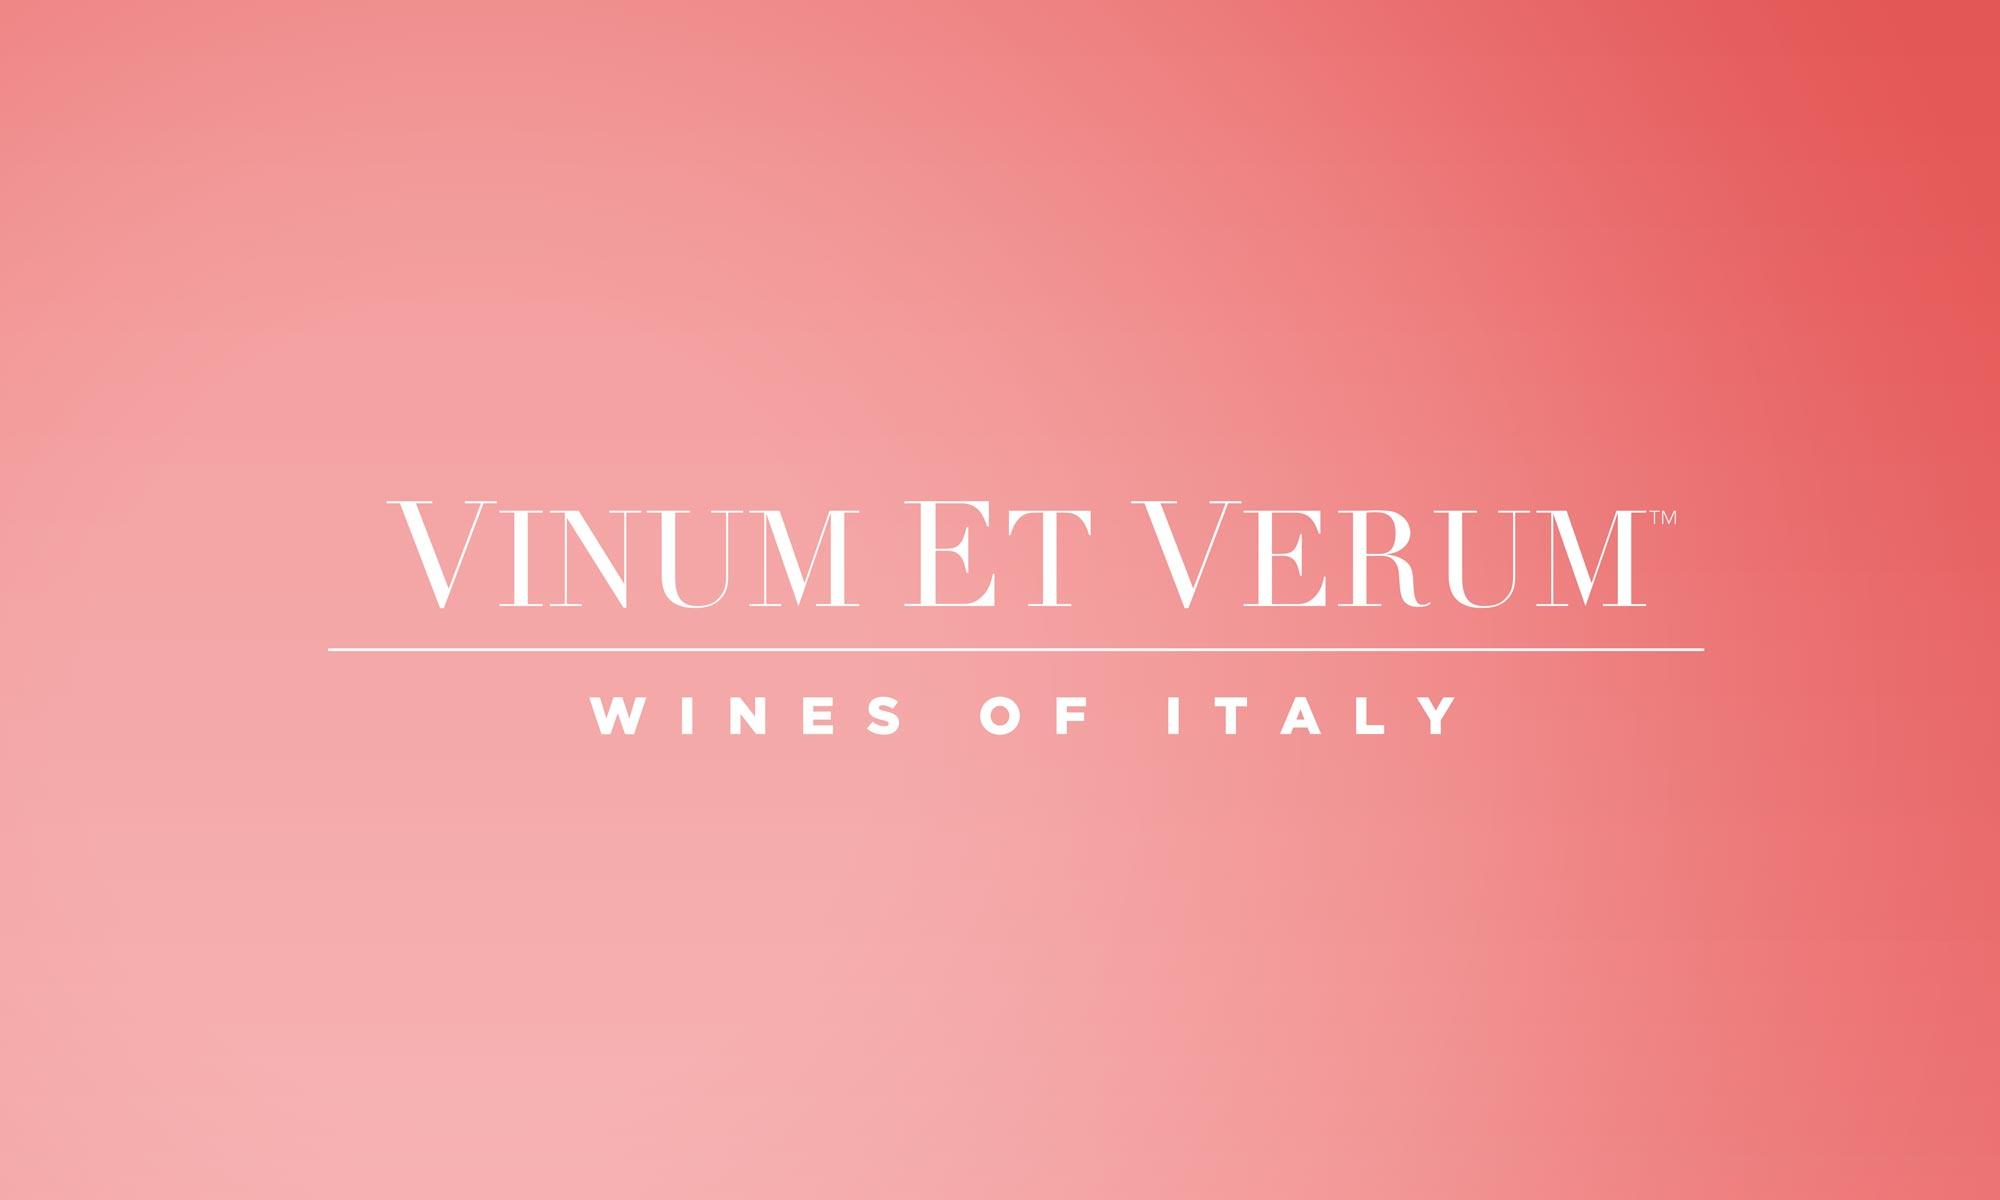 https://www.atelierzoz.com/wp-content/uploads/2020/03/works_vinum-et-verum-1.jpg